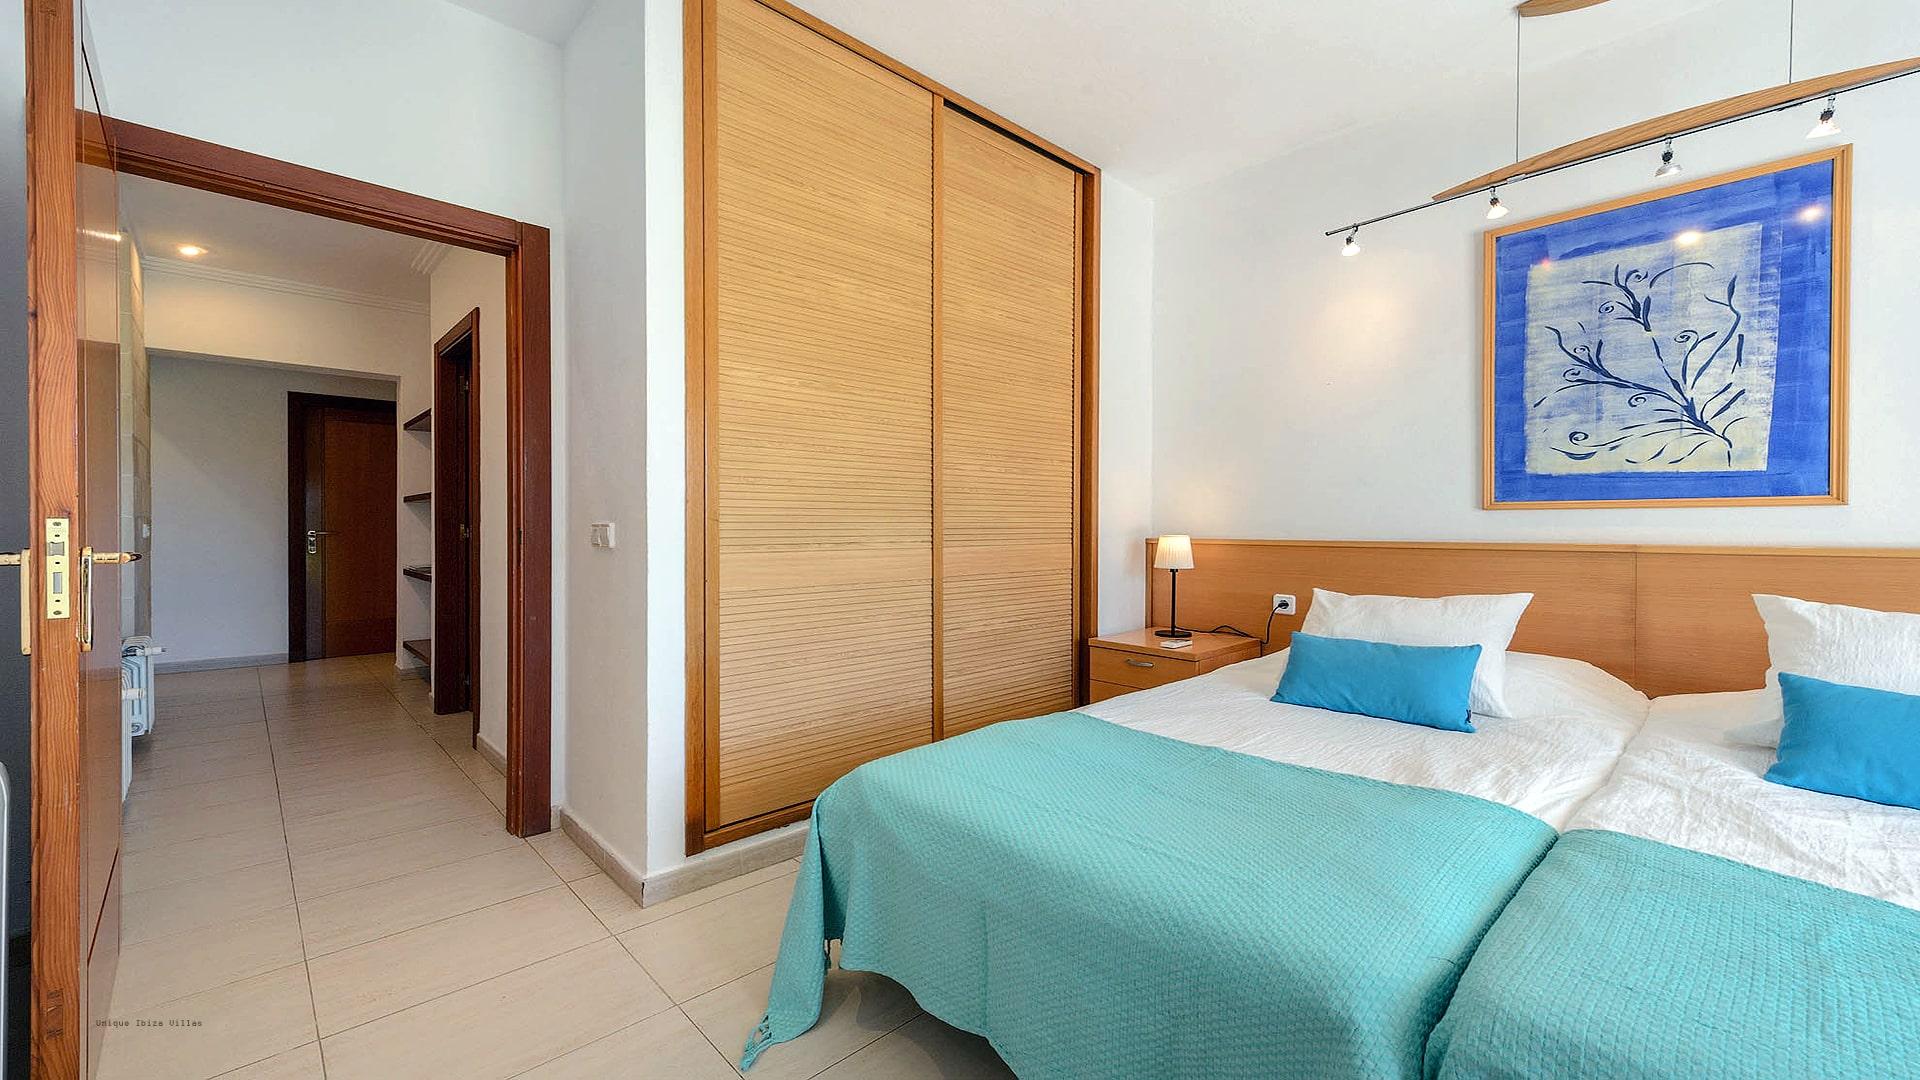 Villa Can Fluxa Ibiza 45 Bedroom 3